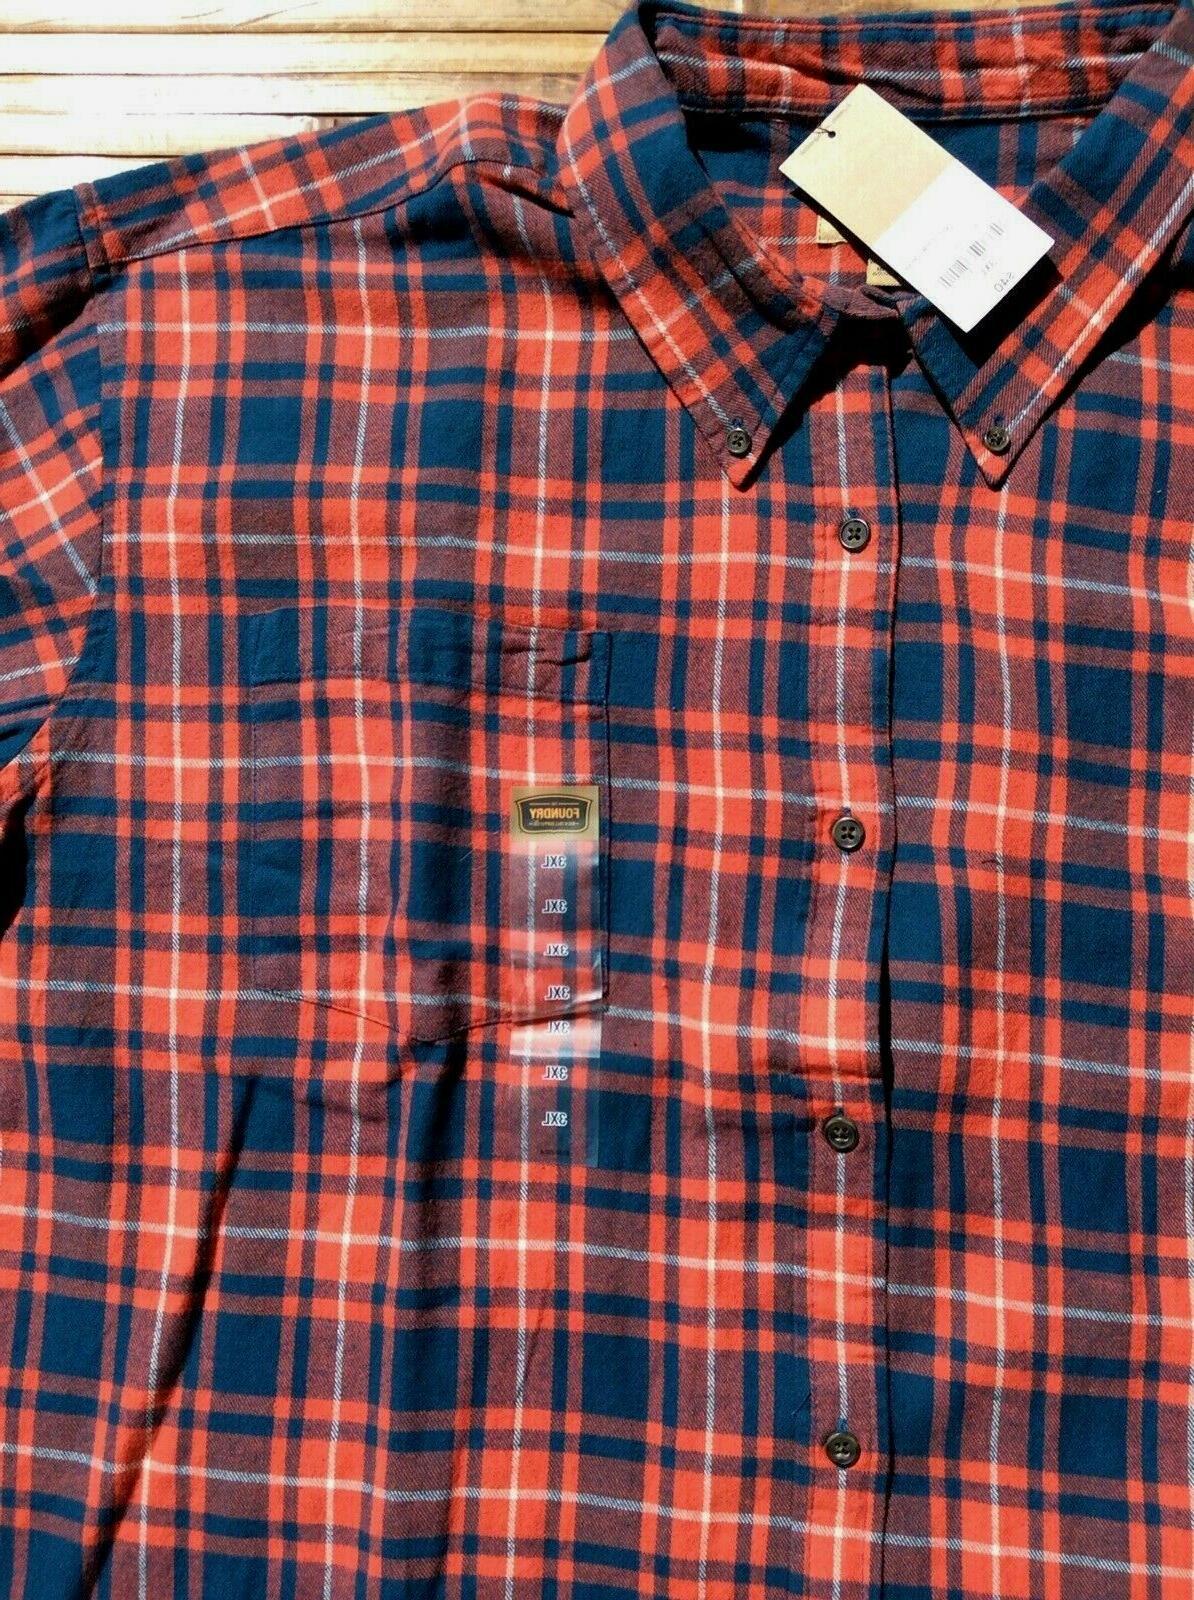 Foundry Size Tall Mens Shirt 3XL 3XLT